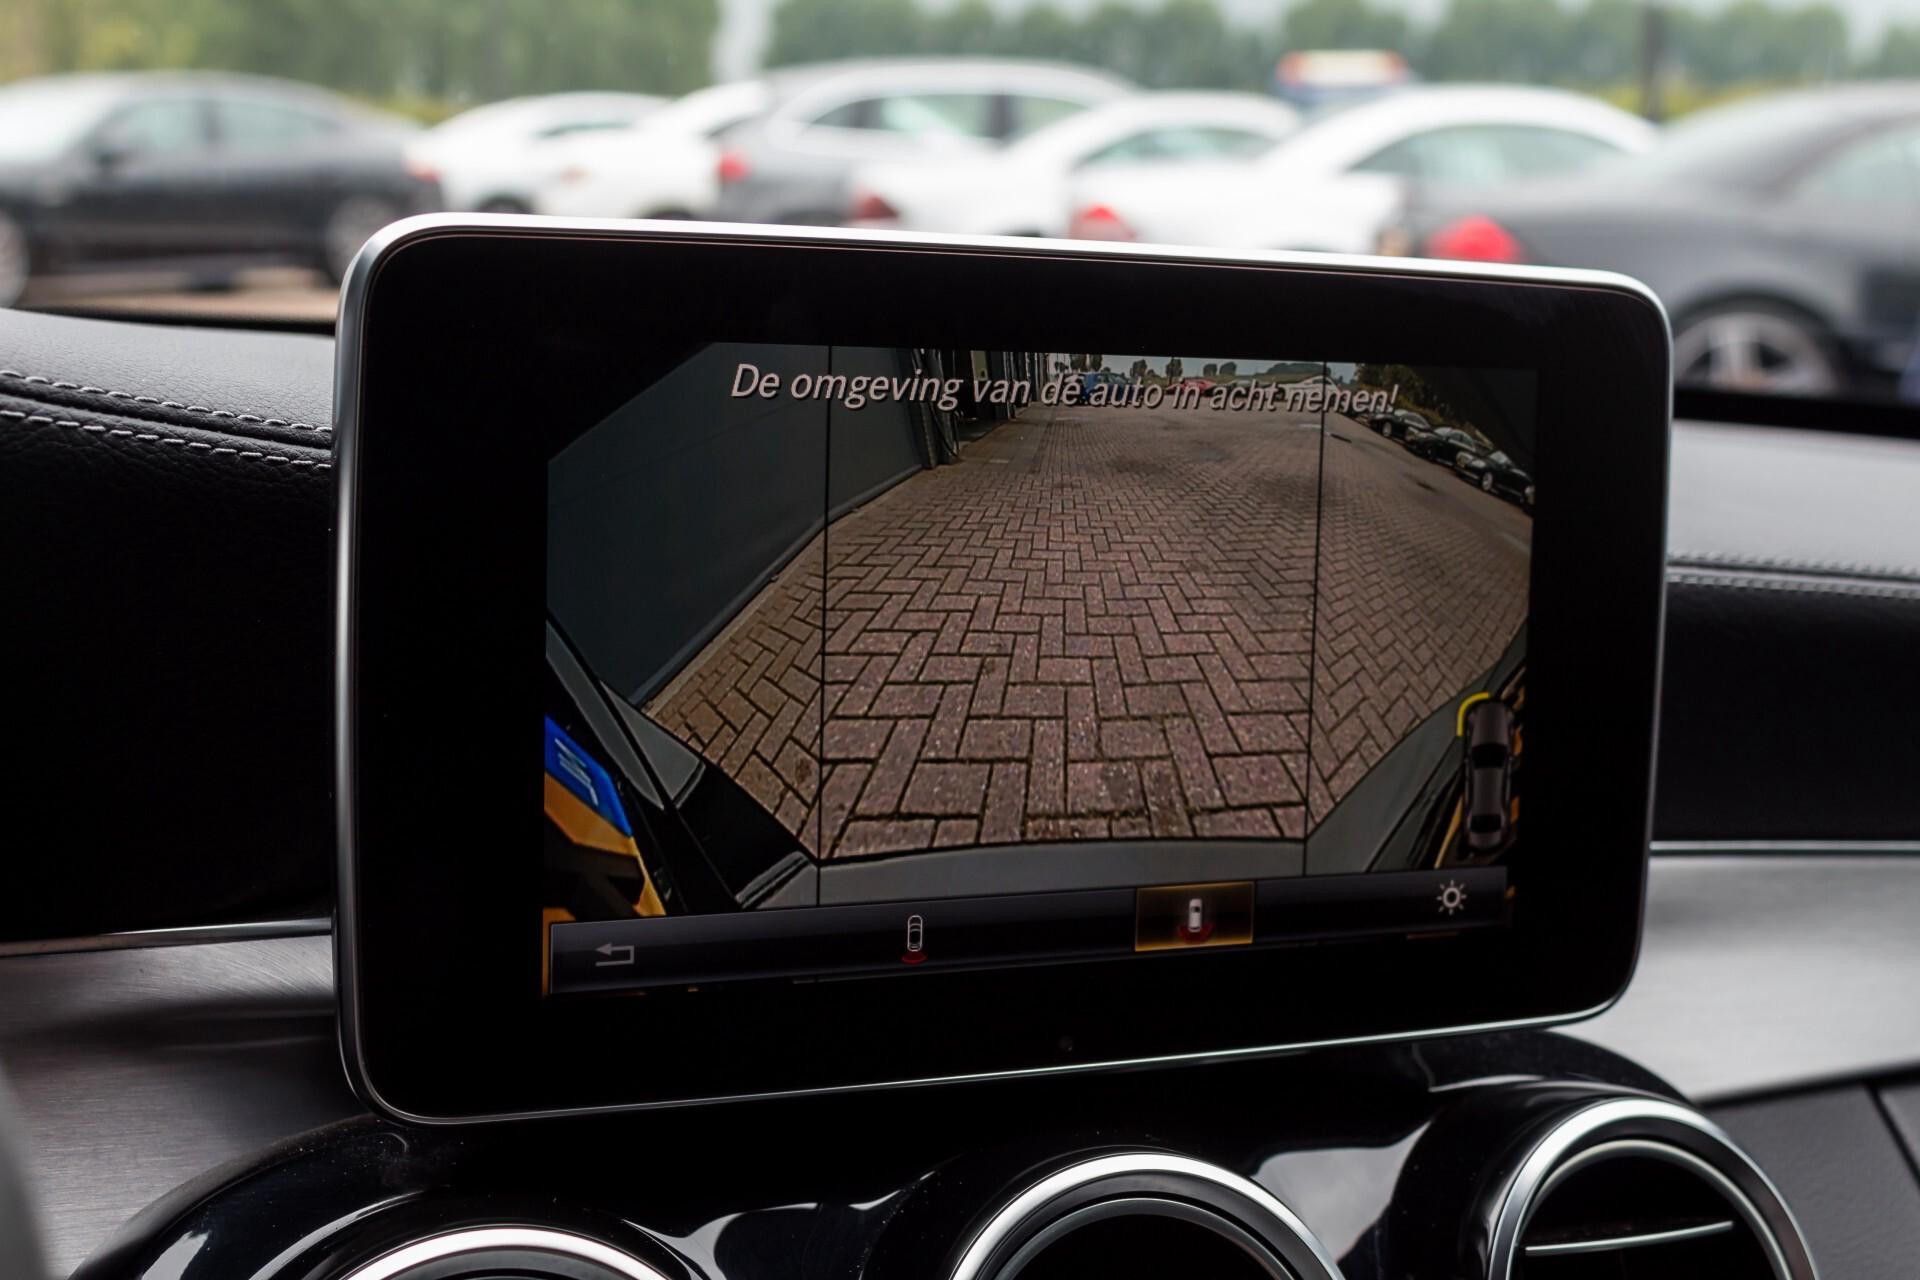 Mercedes-Benz C-Klasse 63 AMG S Panorama/Distronic/Keyless/Comand/Camera/ILS Aut7 Foto 22